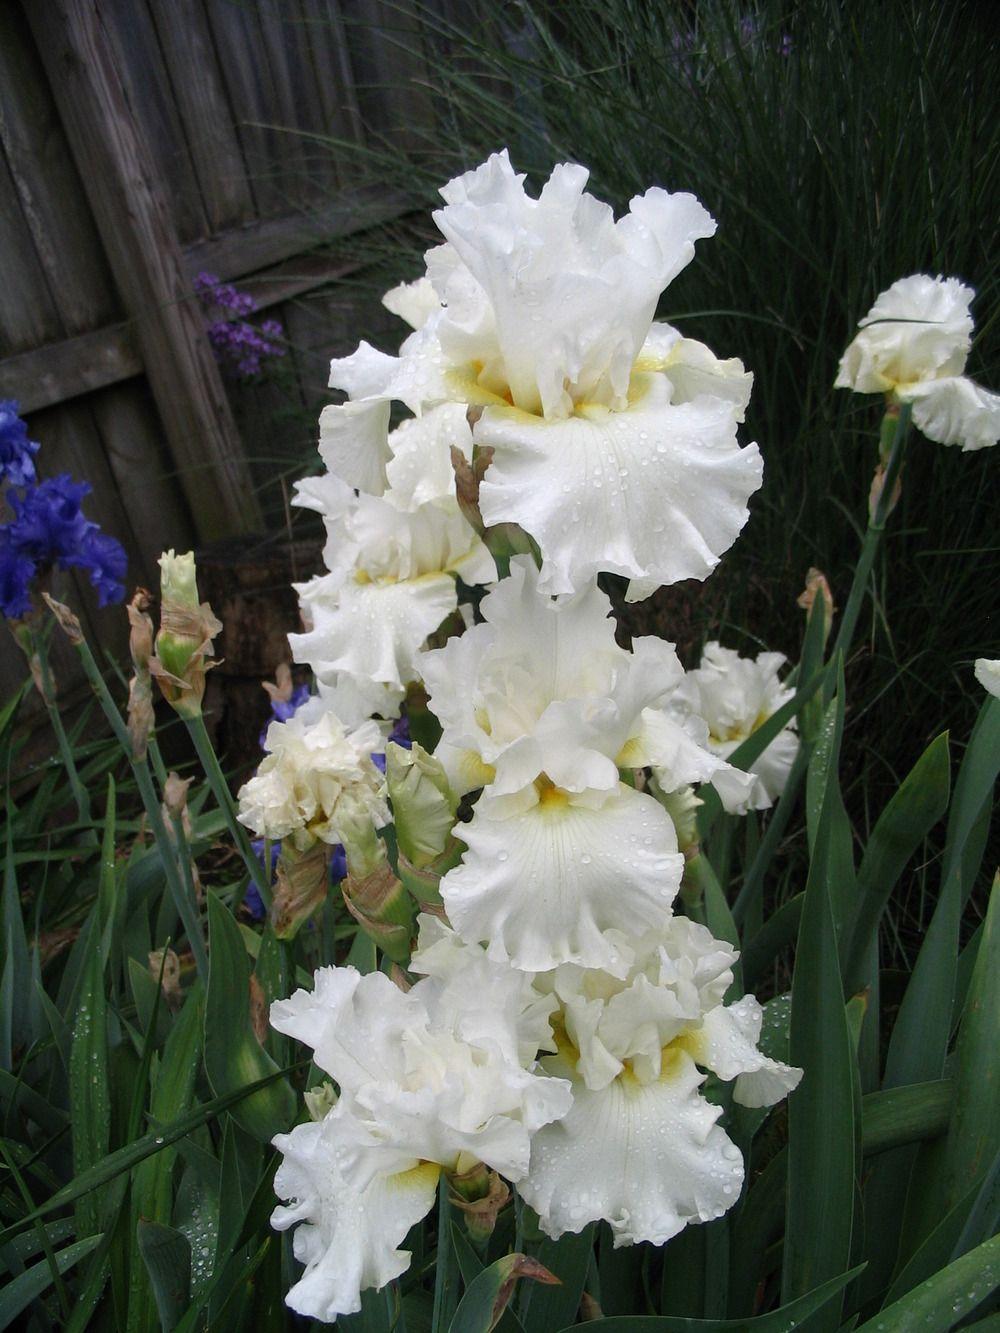 Photo of tall bearded iris iris uroyal birthu uploaded by